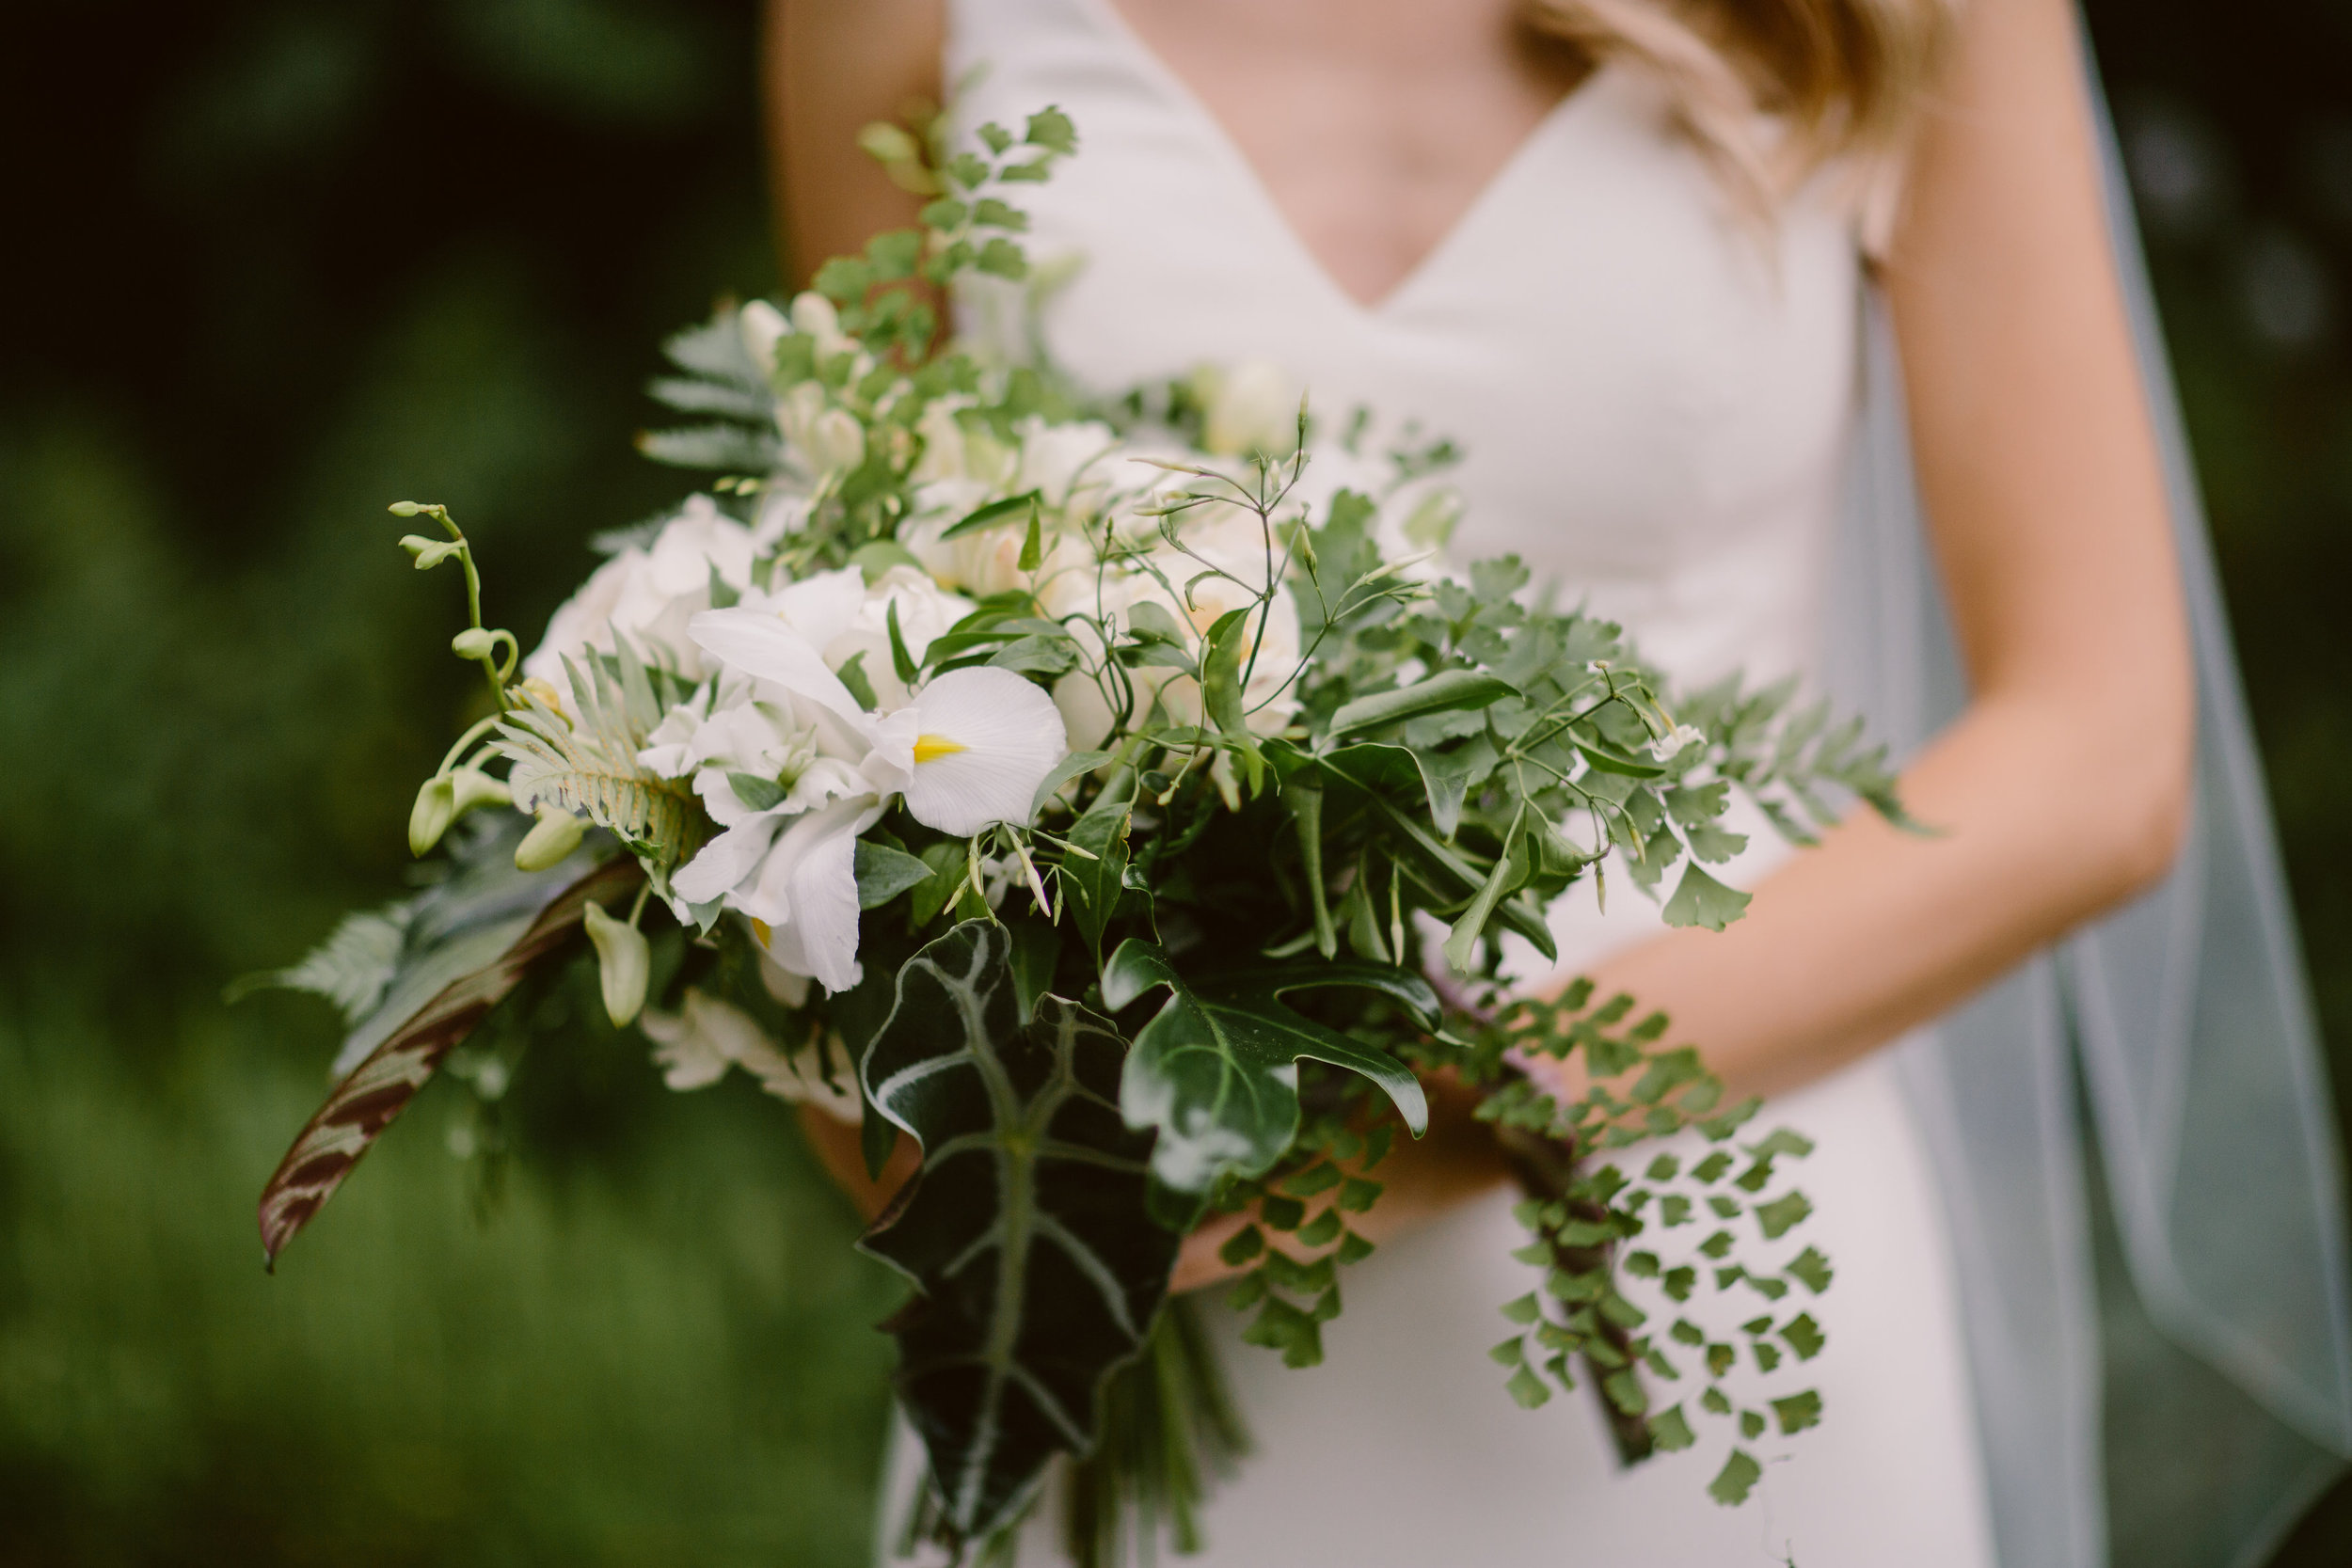 Nice bunch ethical floral design studio flower garden by Sula Northbrook Park wedding bouquet